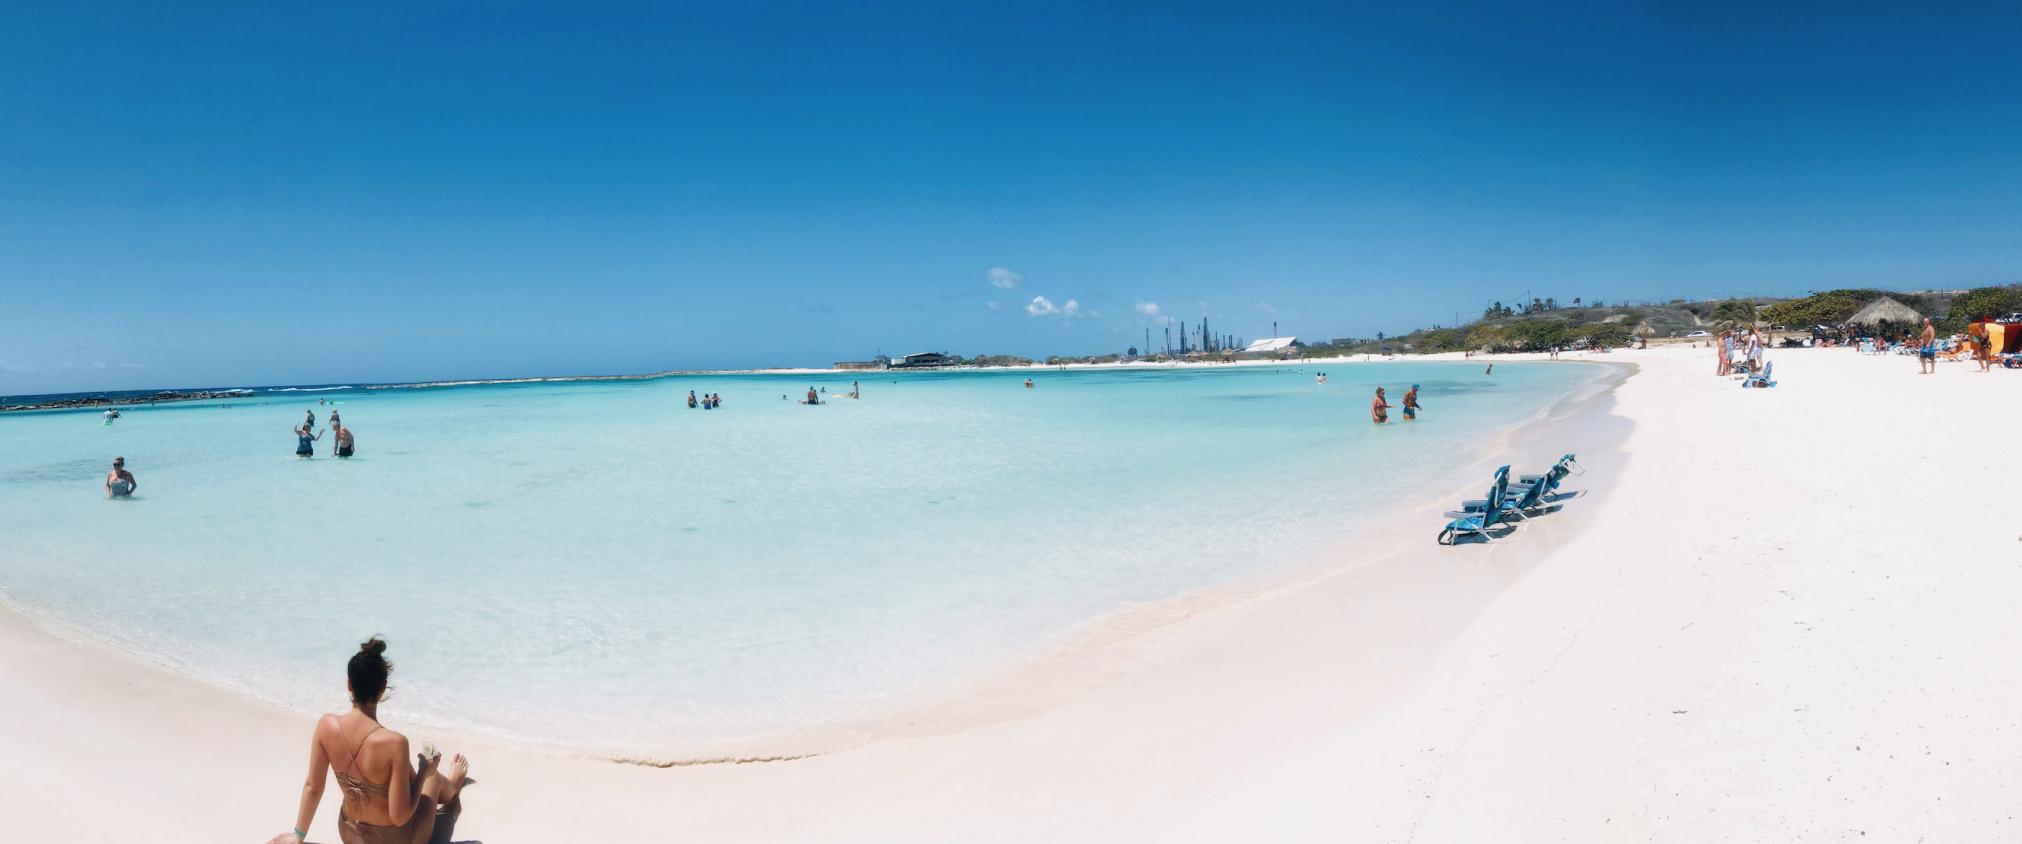 Aruba recap